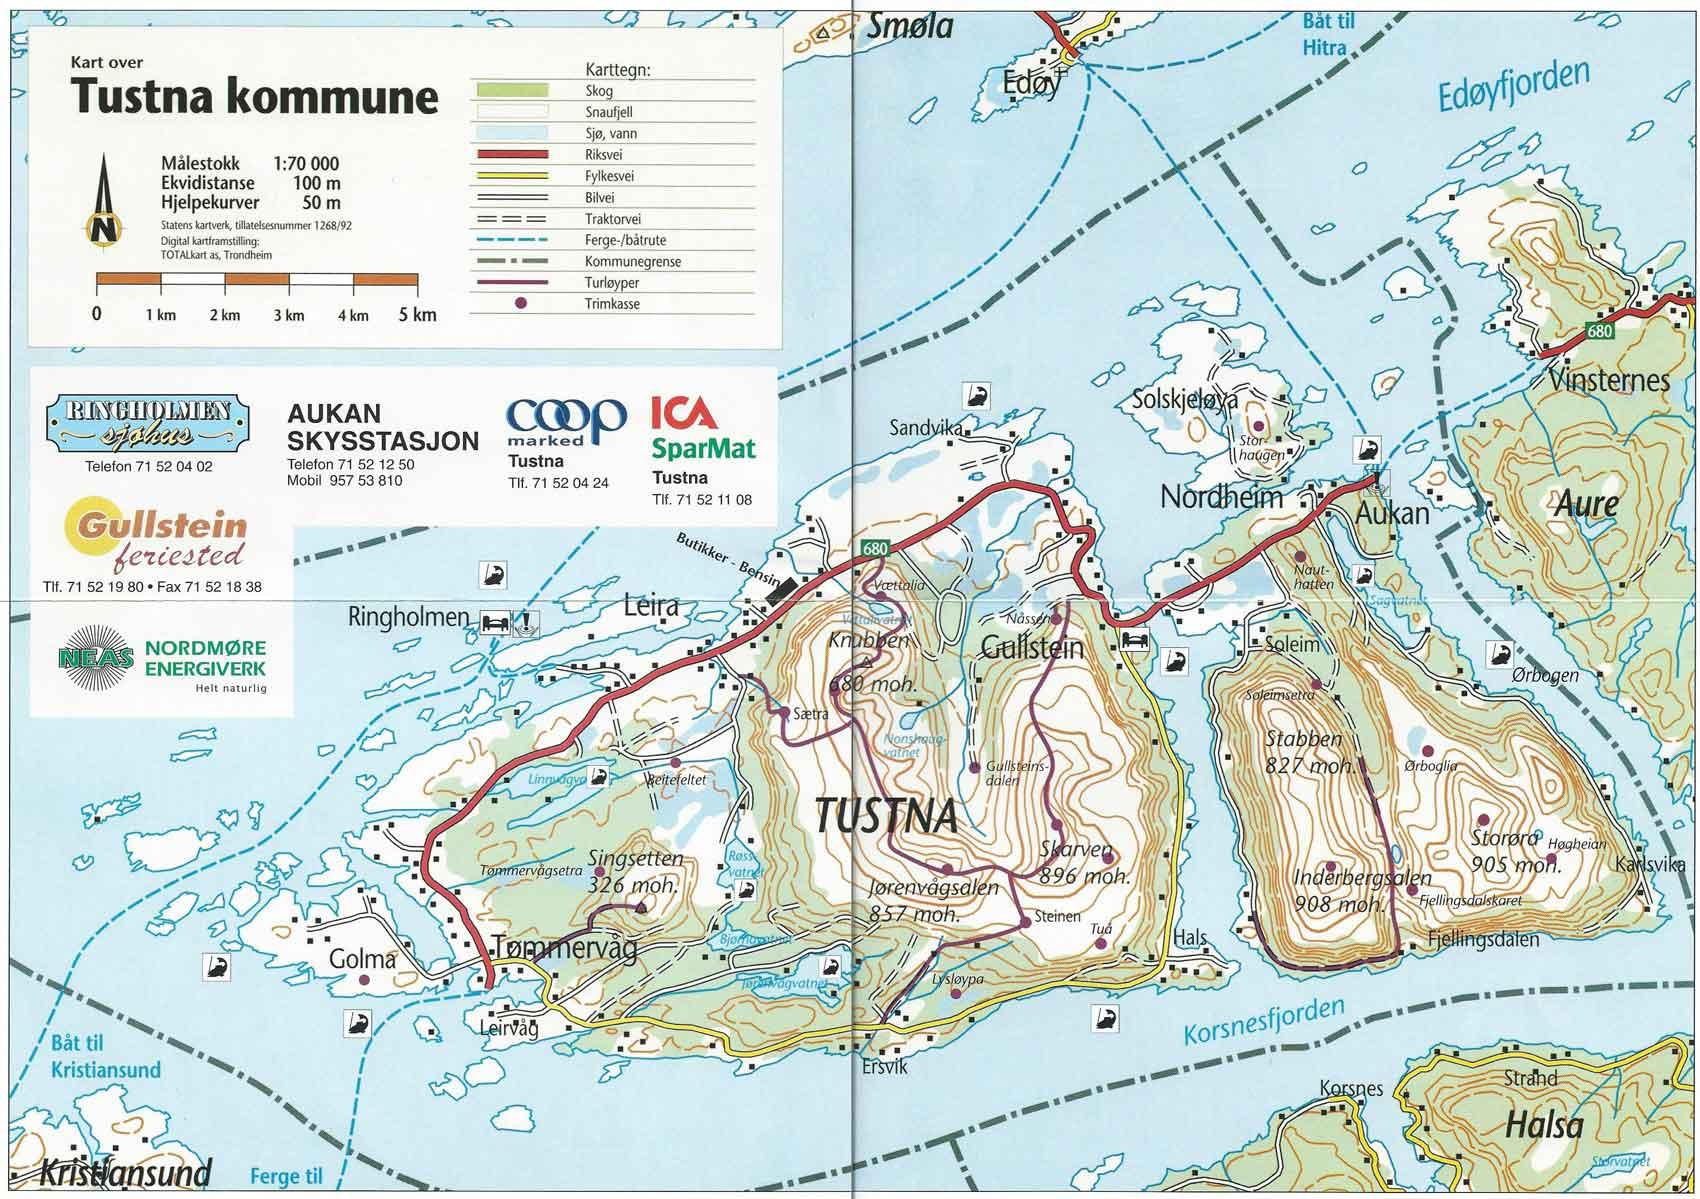 kart over tustna Tustna idrettslag | Turløyper kart over tustna